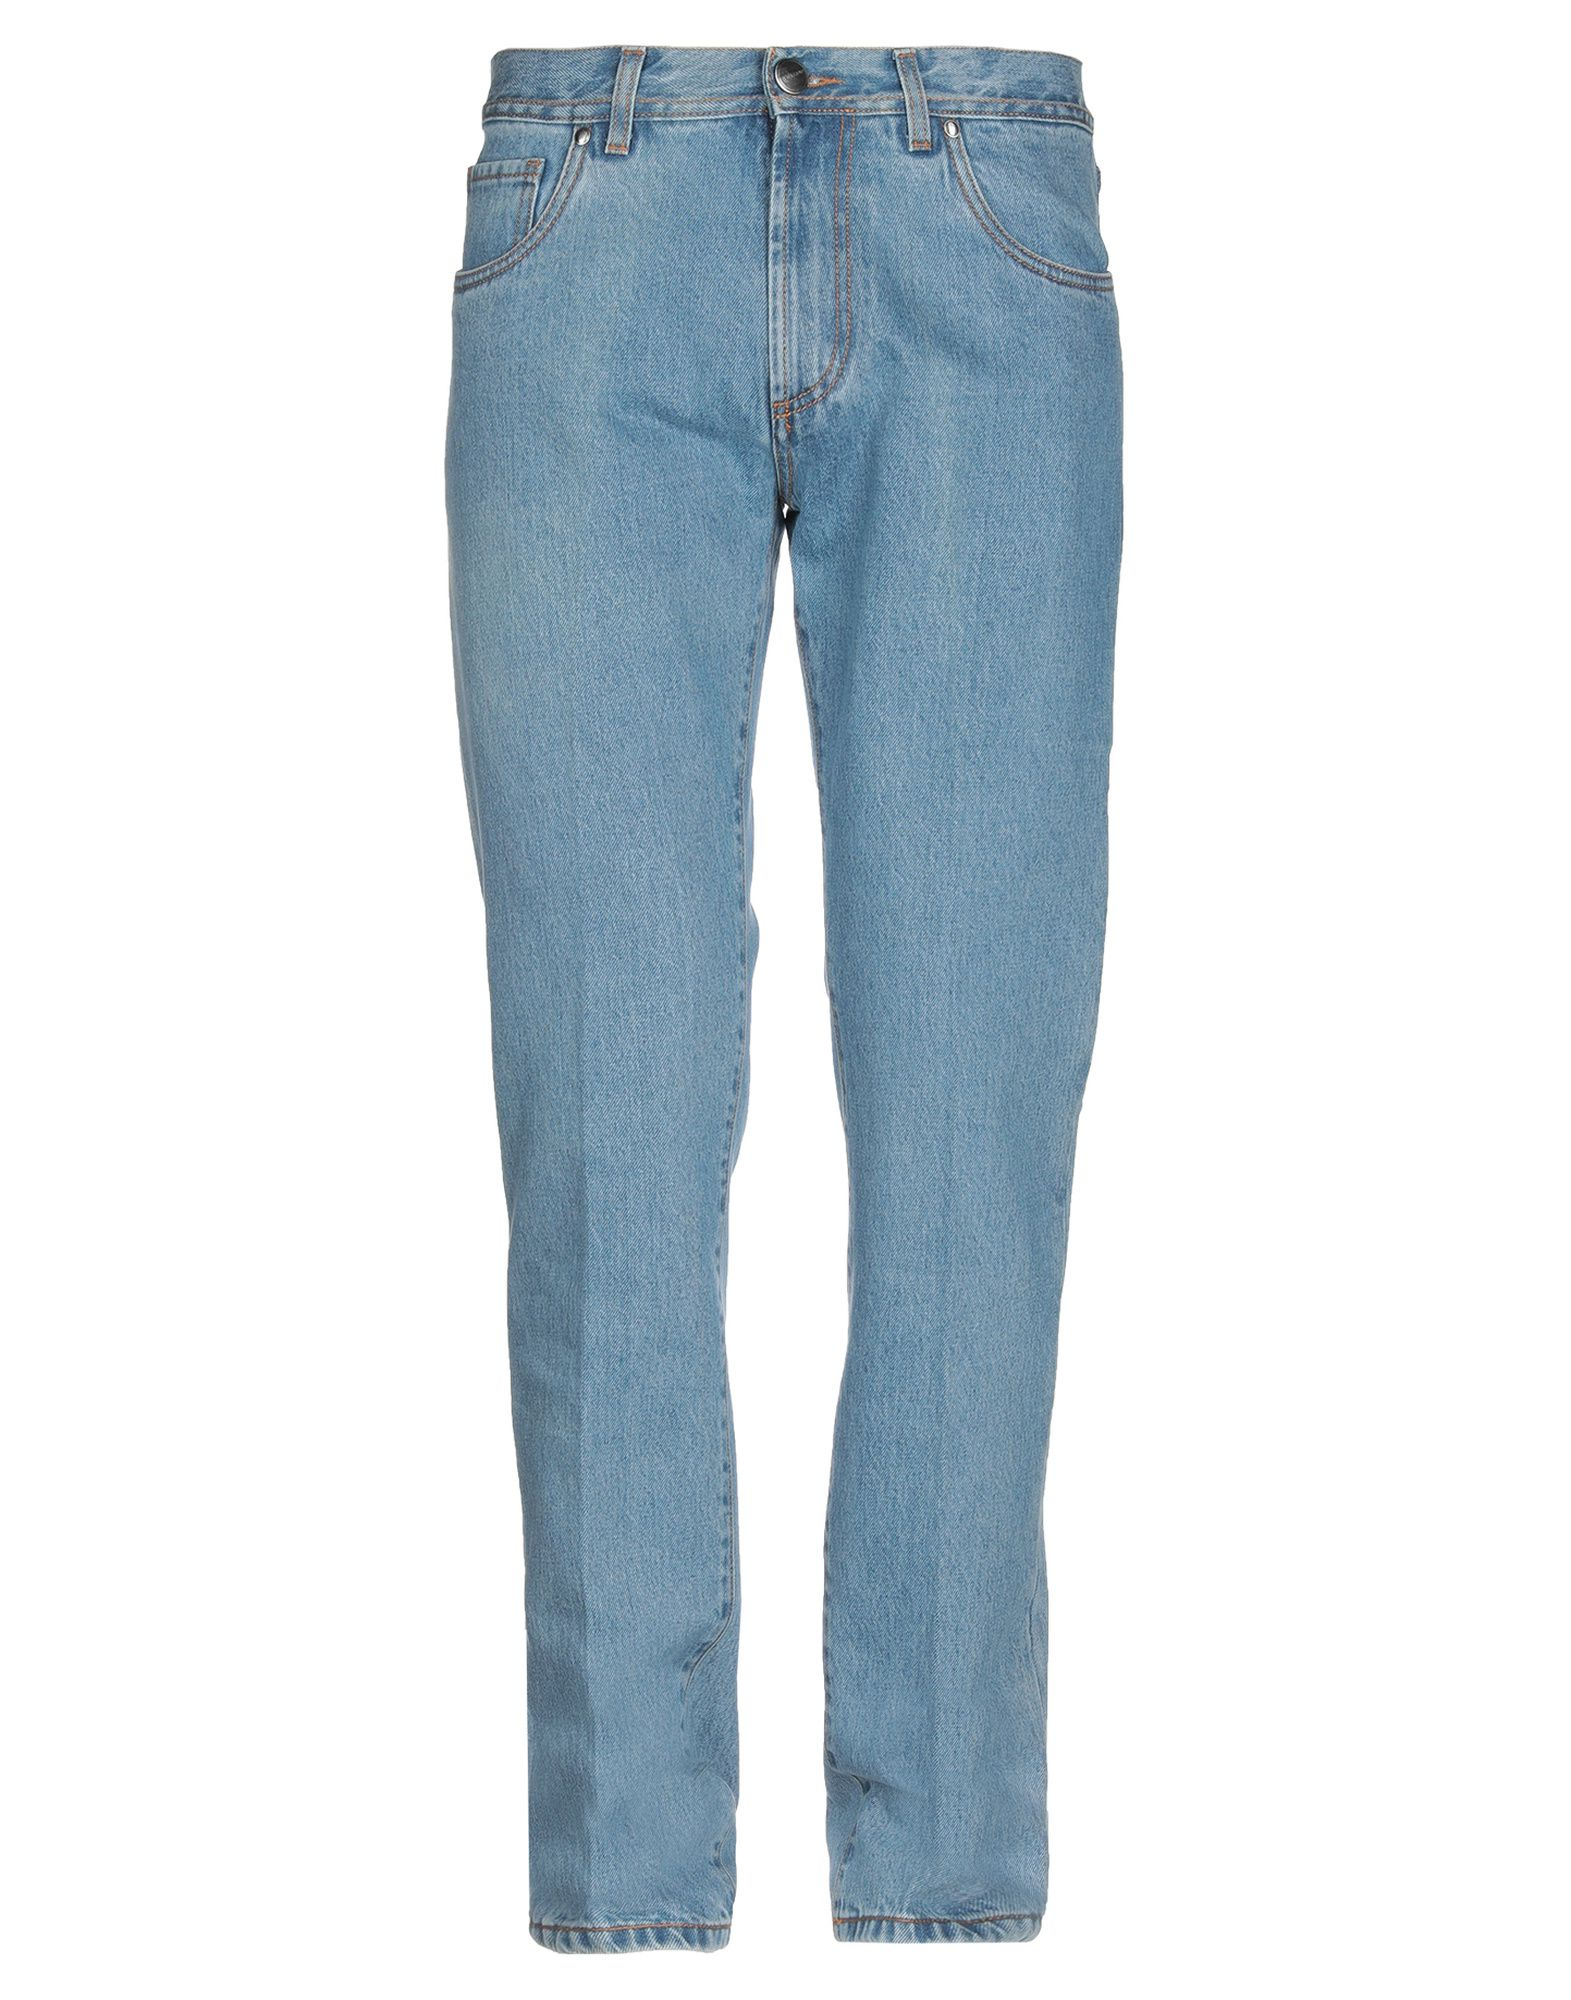 RICHARD JAMES BROWN Джинсовые брюки james brown james brown night train colour